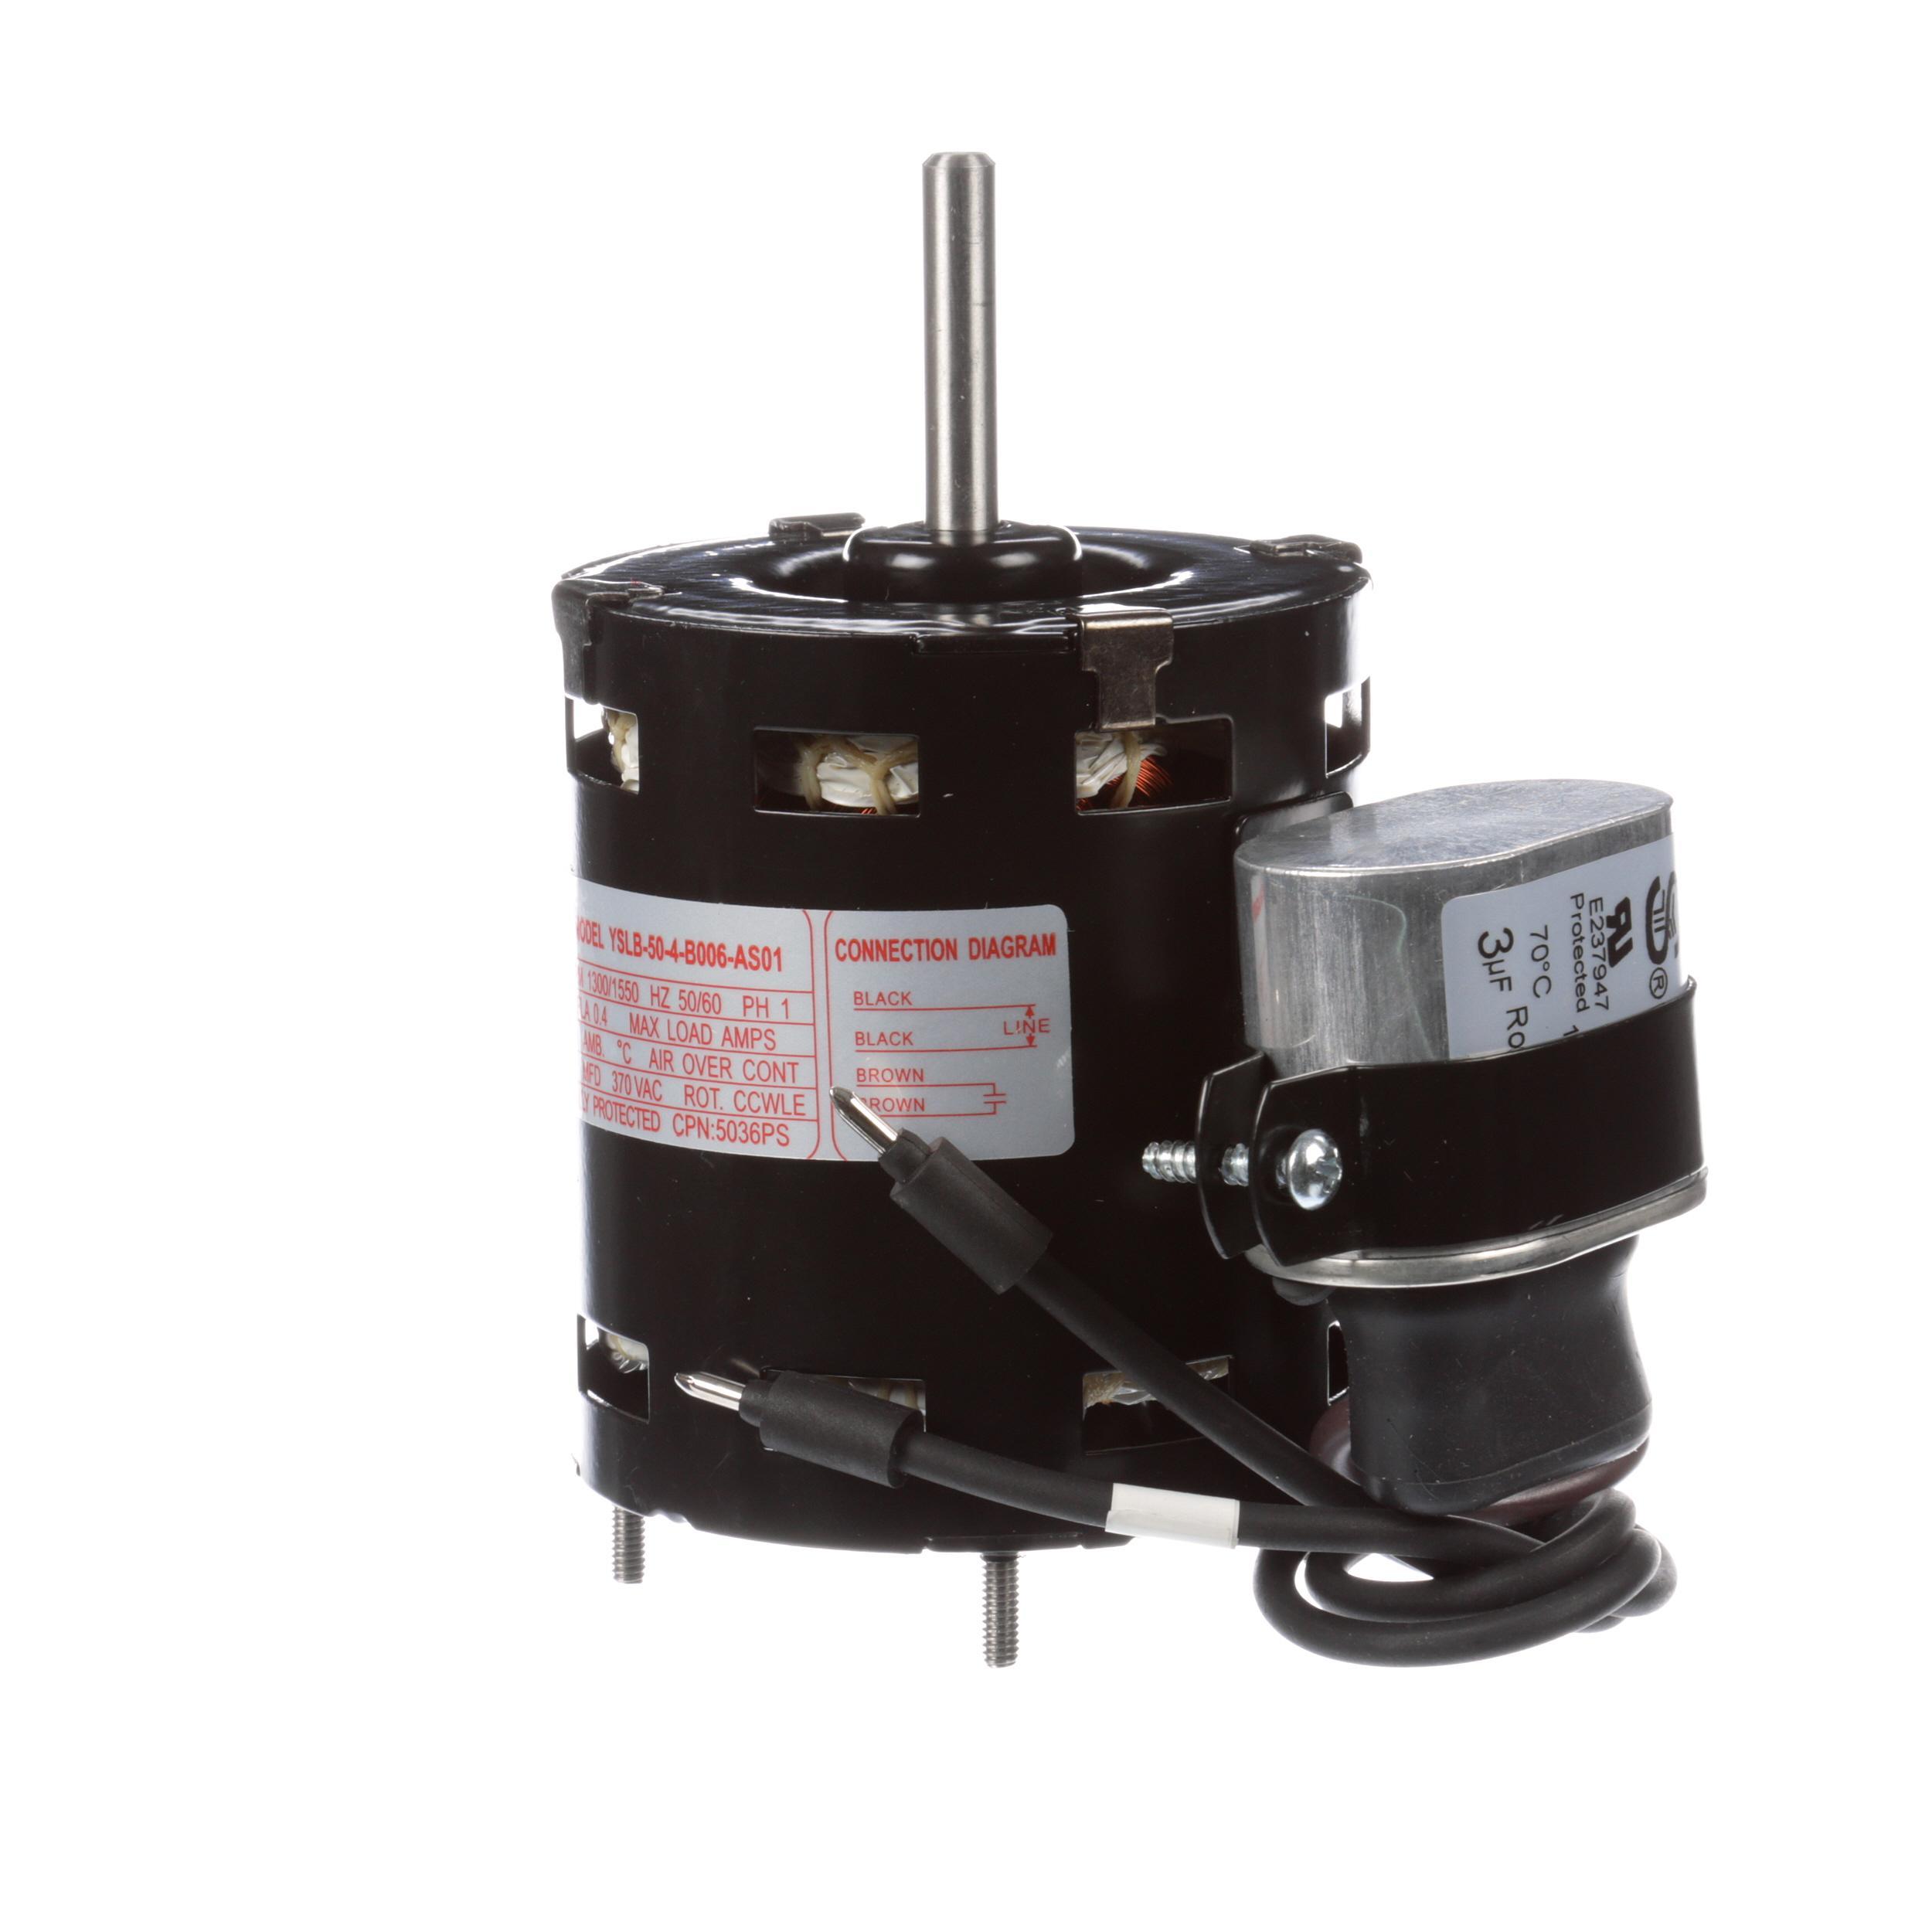 Bohn Evaporators Parts Free Download Refrigeration Wiring Diagrams Let1201f Evaporator Fan Motor Part 5036ps